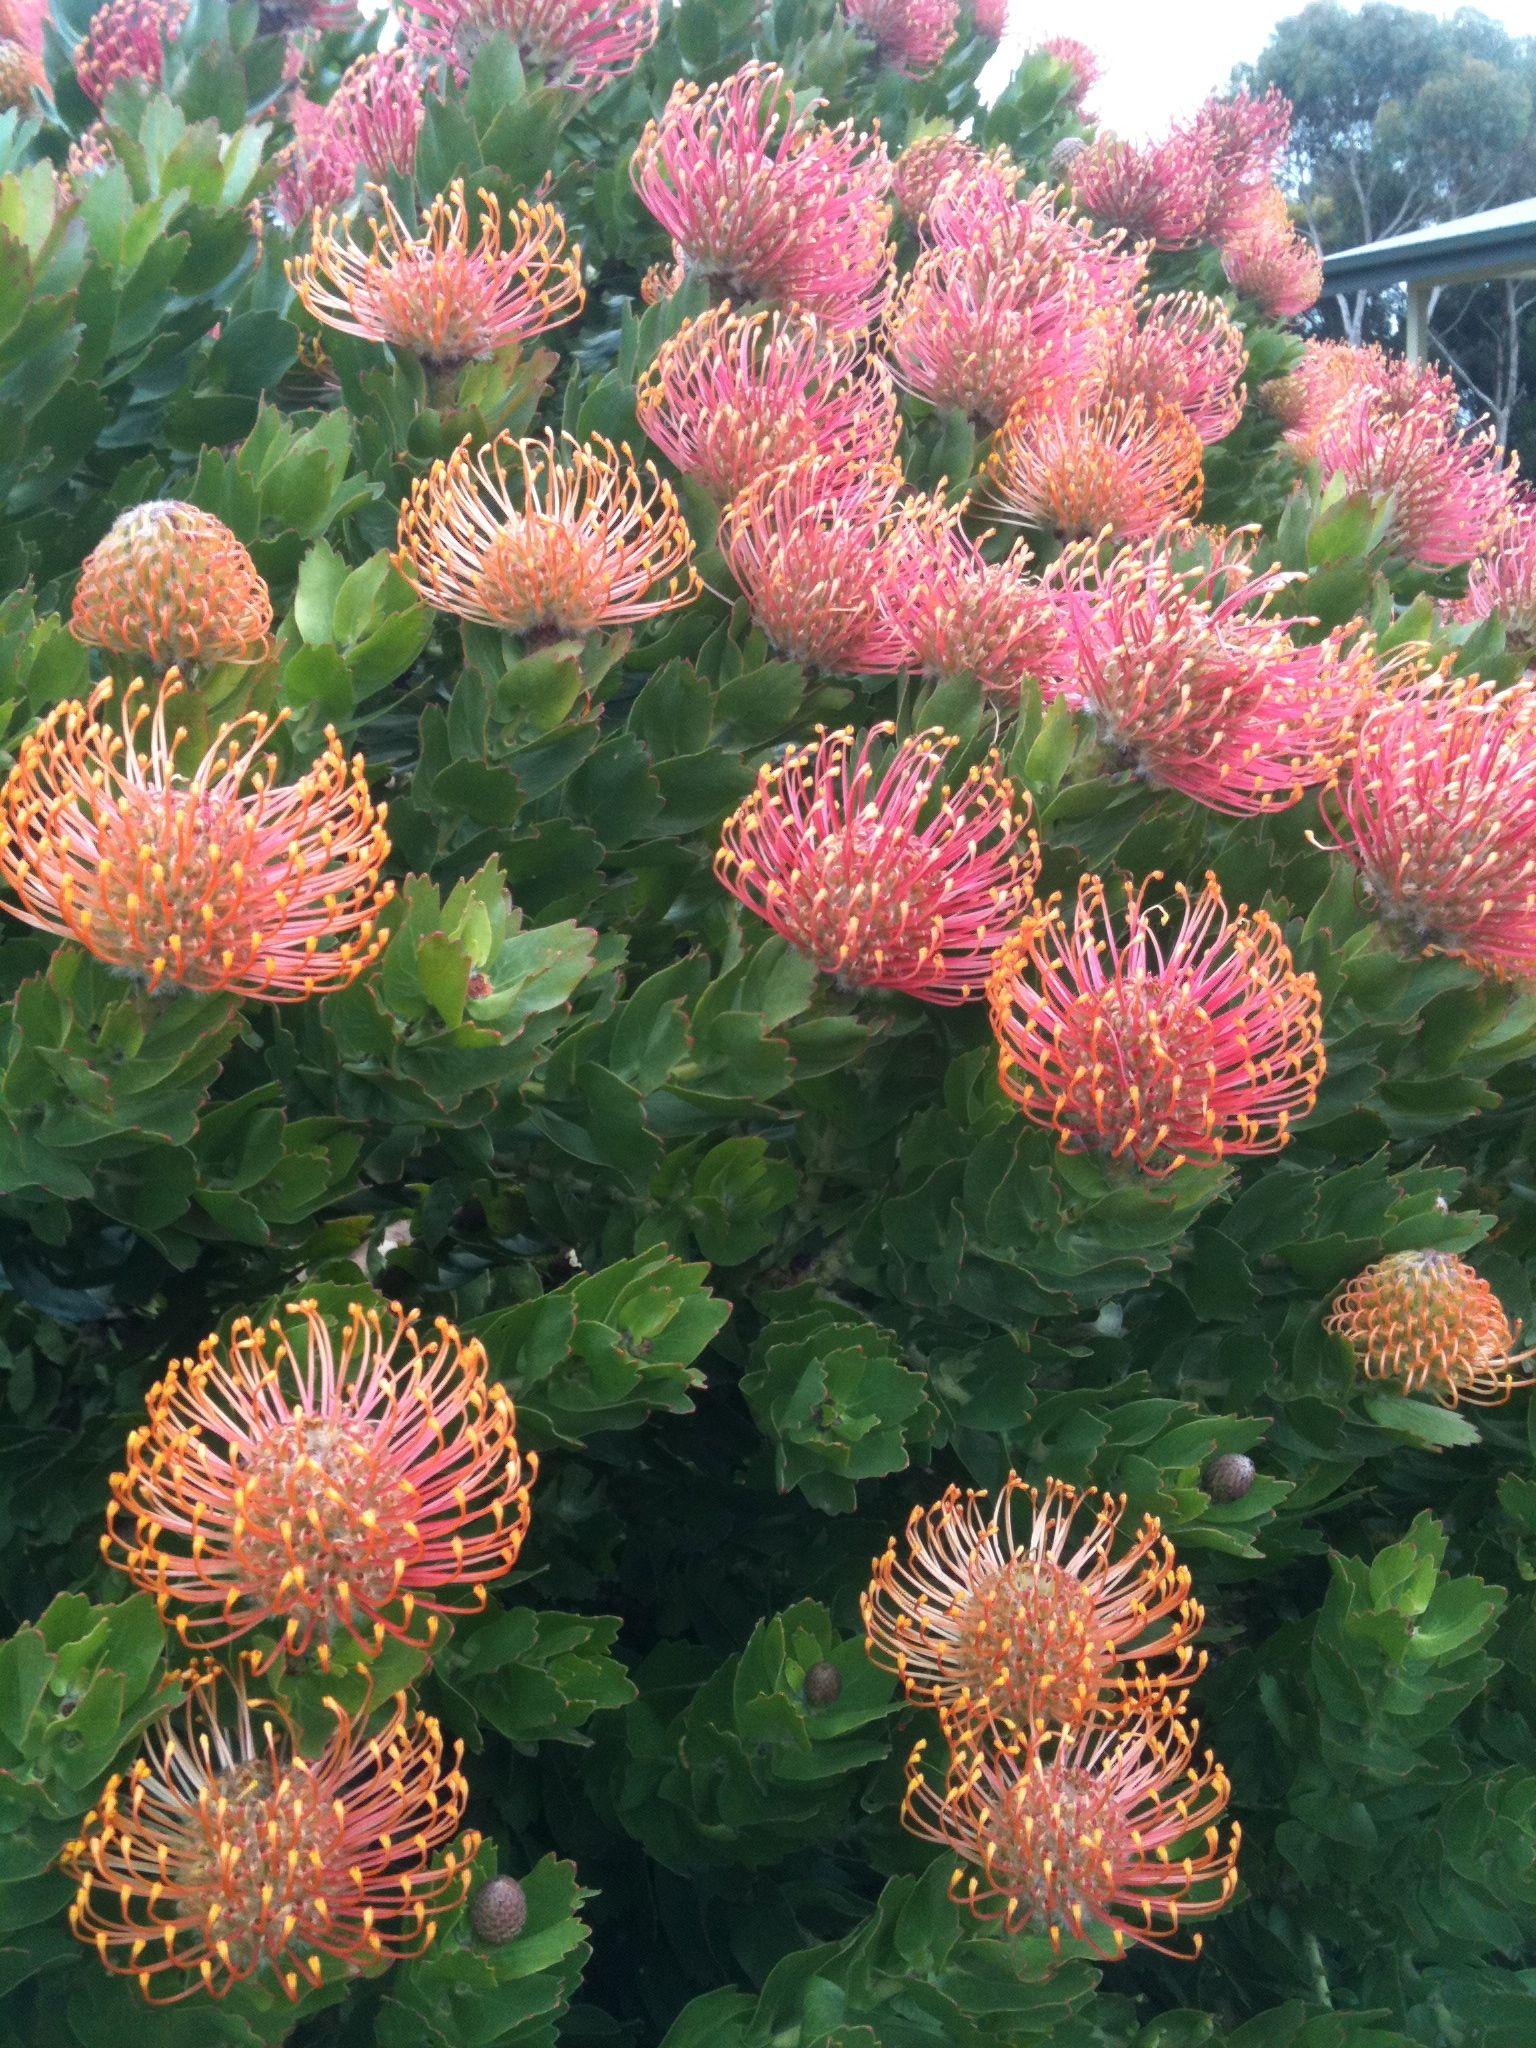 Protea Australia Australian Flowers Plants Australian Plants